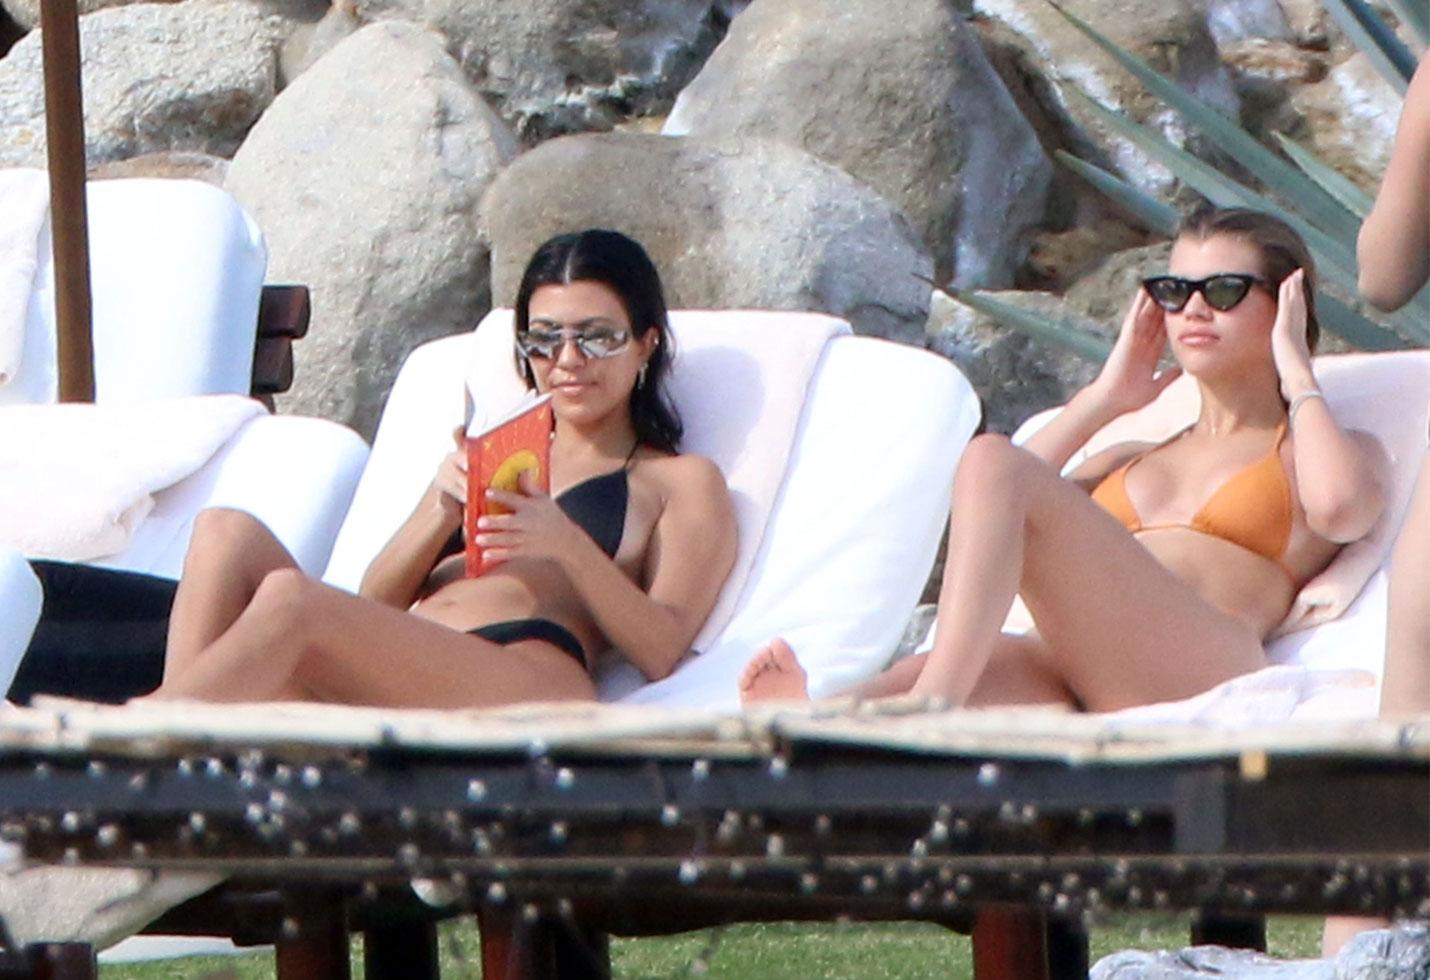 Kourtney kardashian bikini sofia richie scott disick mexico vacation